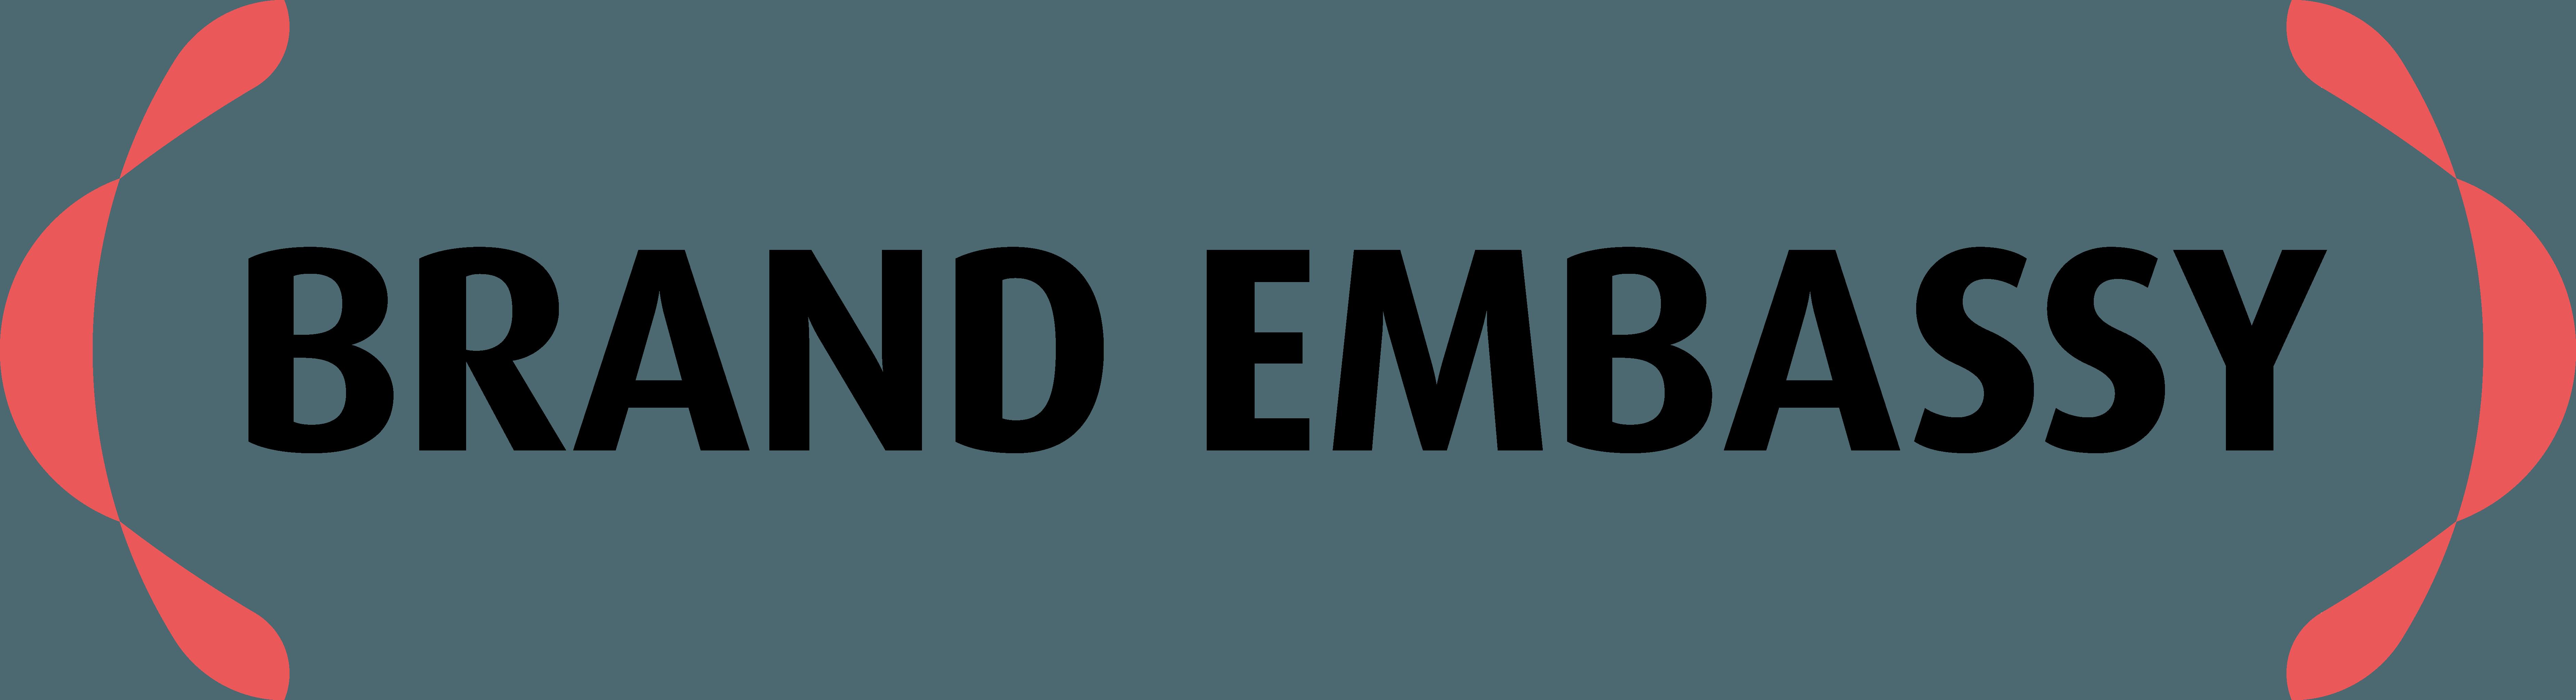 BrandEmbassy Logo-full-red-rgb